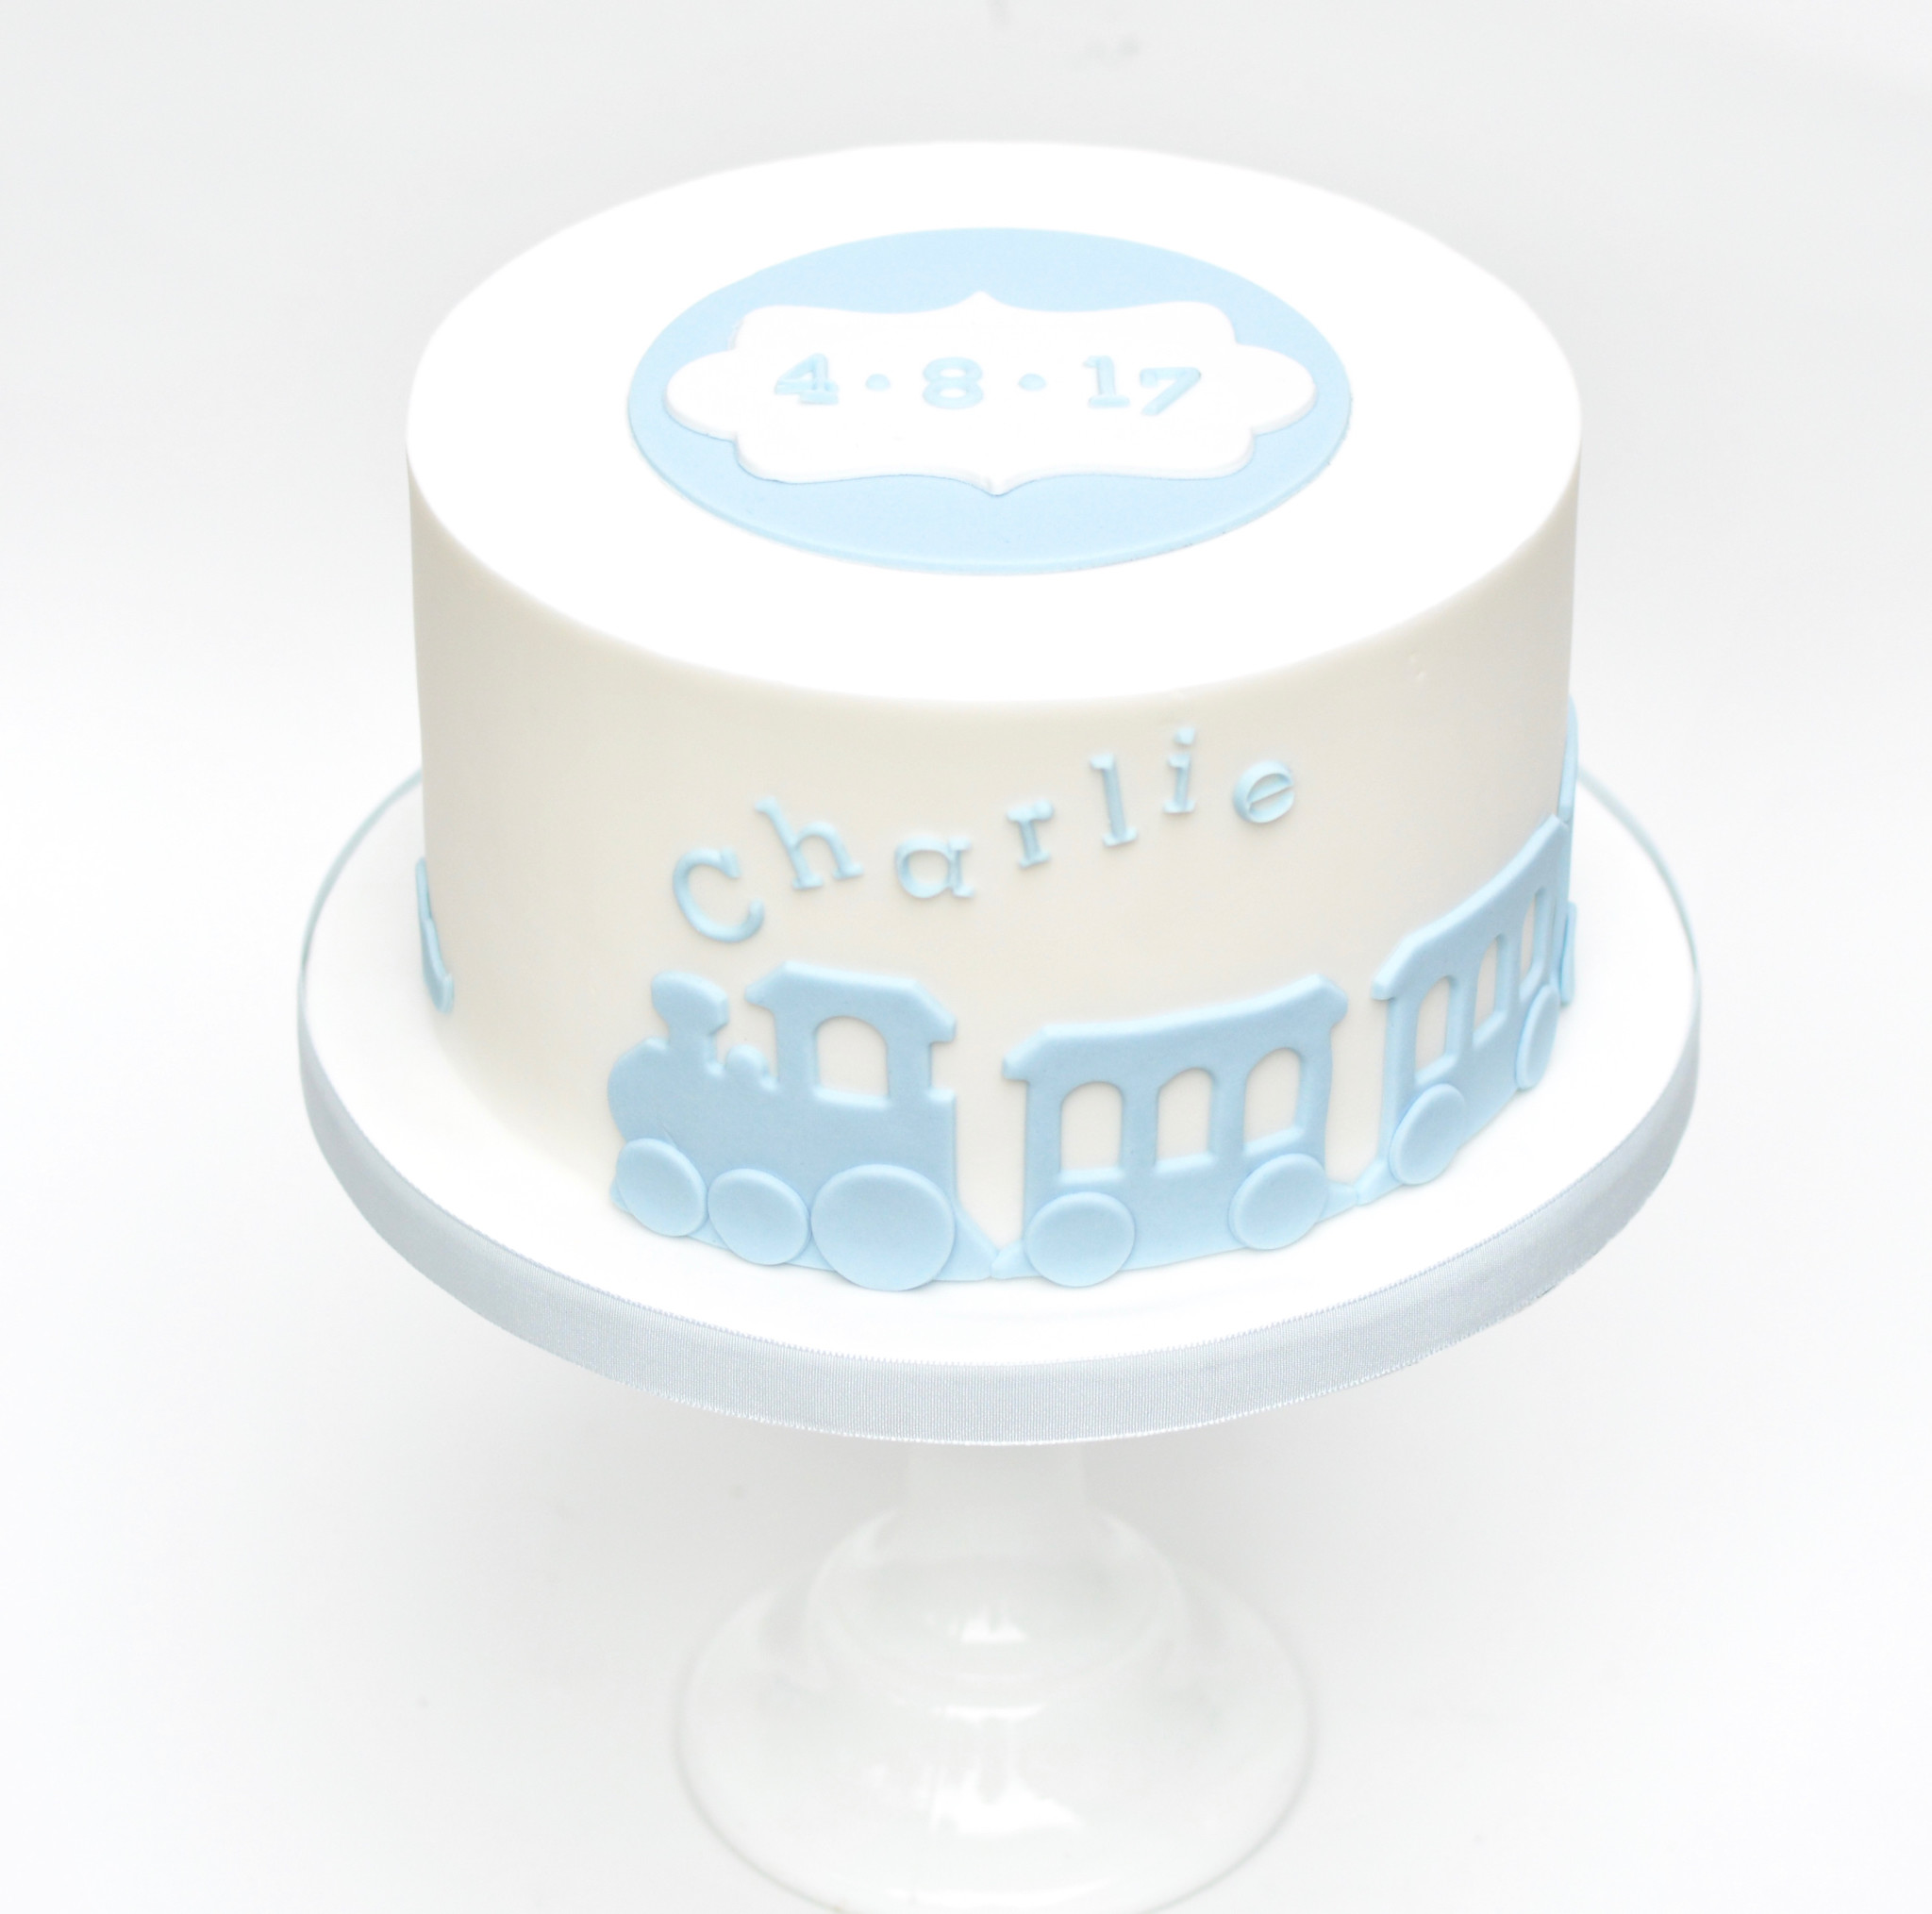 Caroline Goulding Cakes